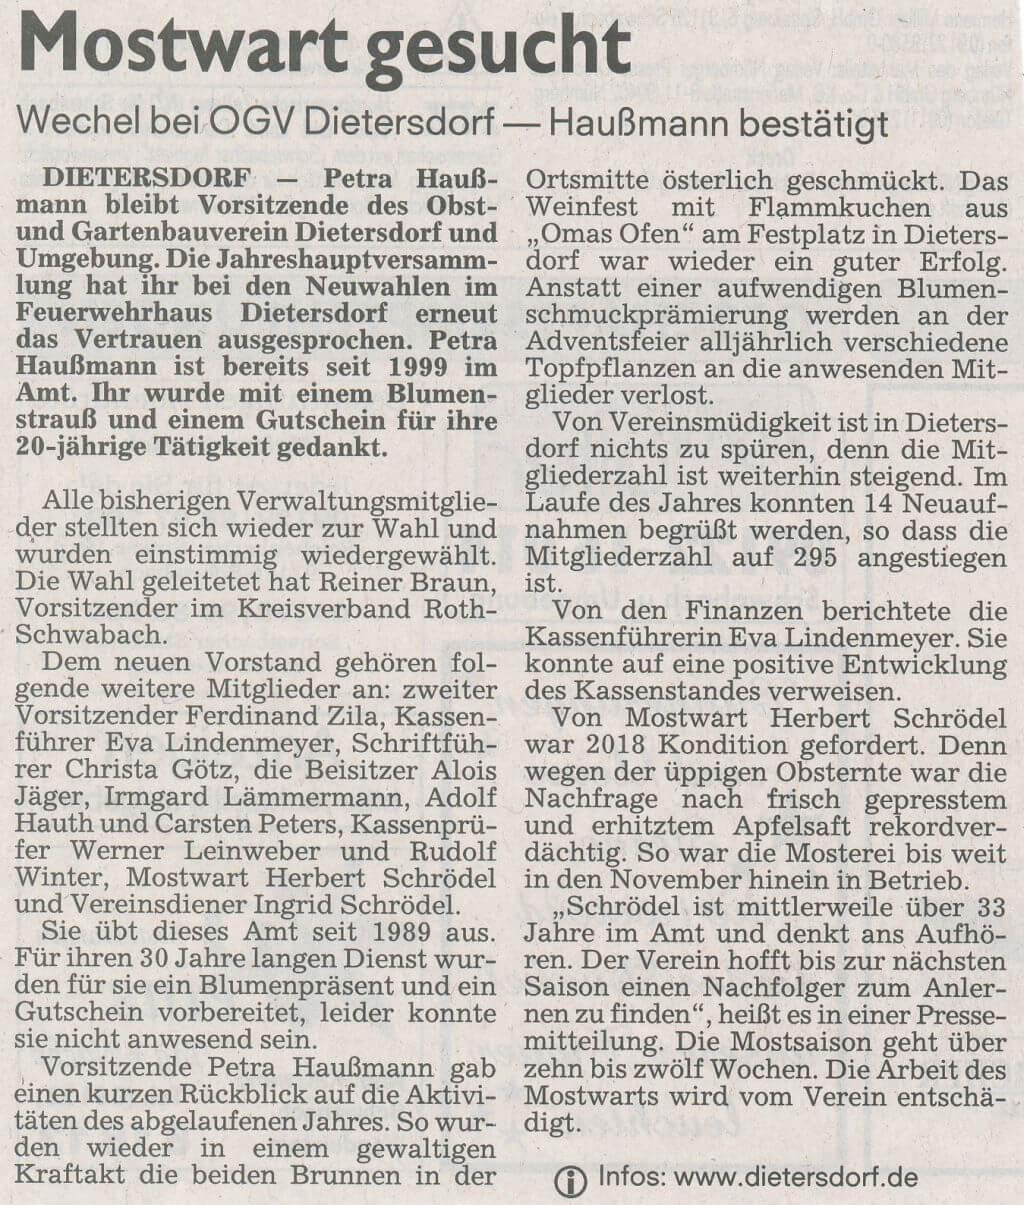 15.03.2019 Mostwart gesucht - Schwabacher Tagblatt